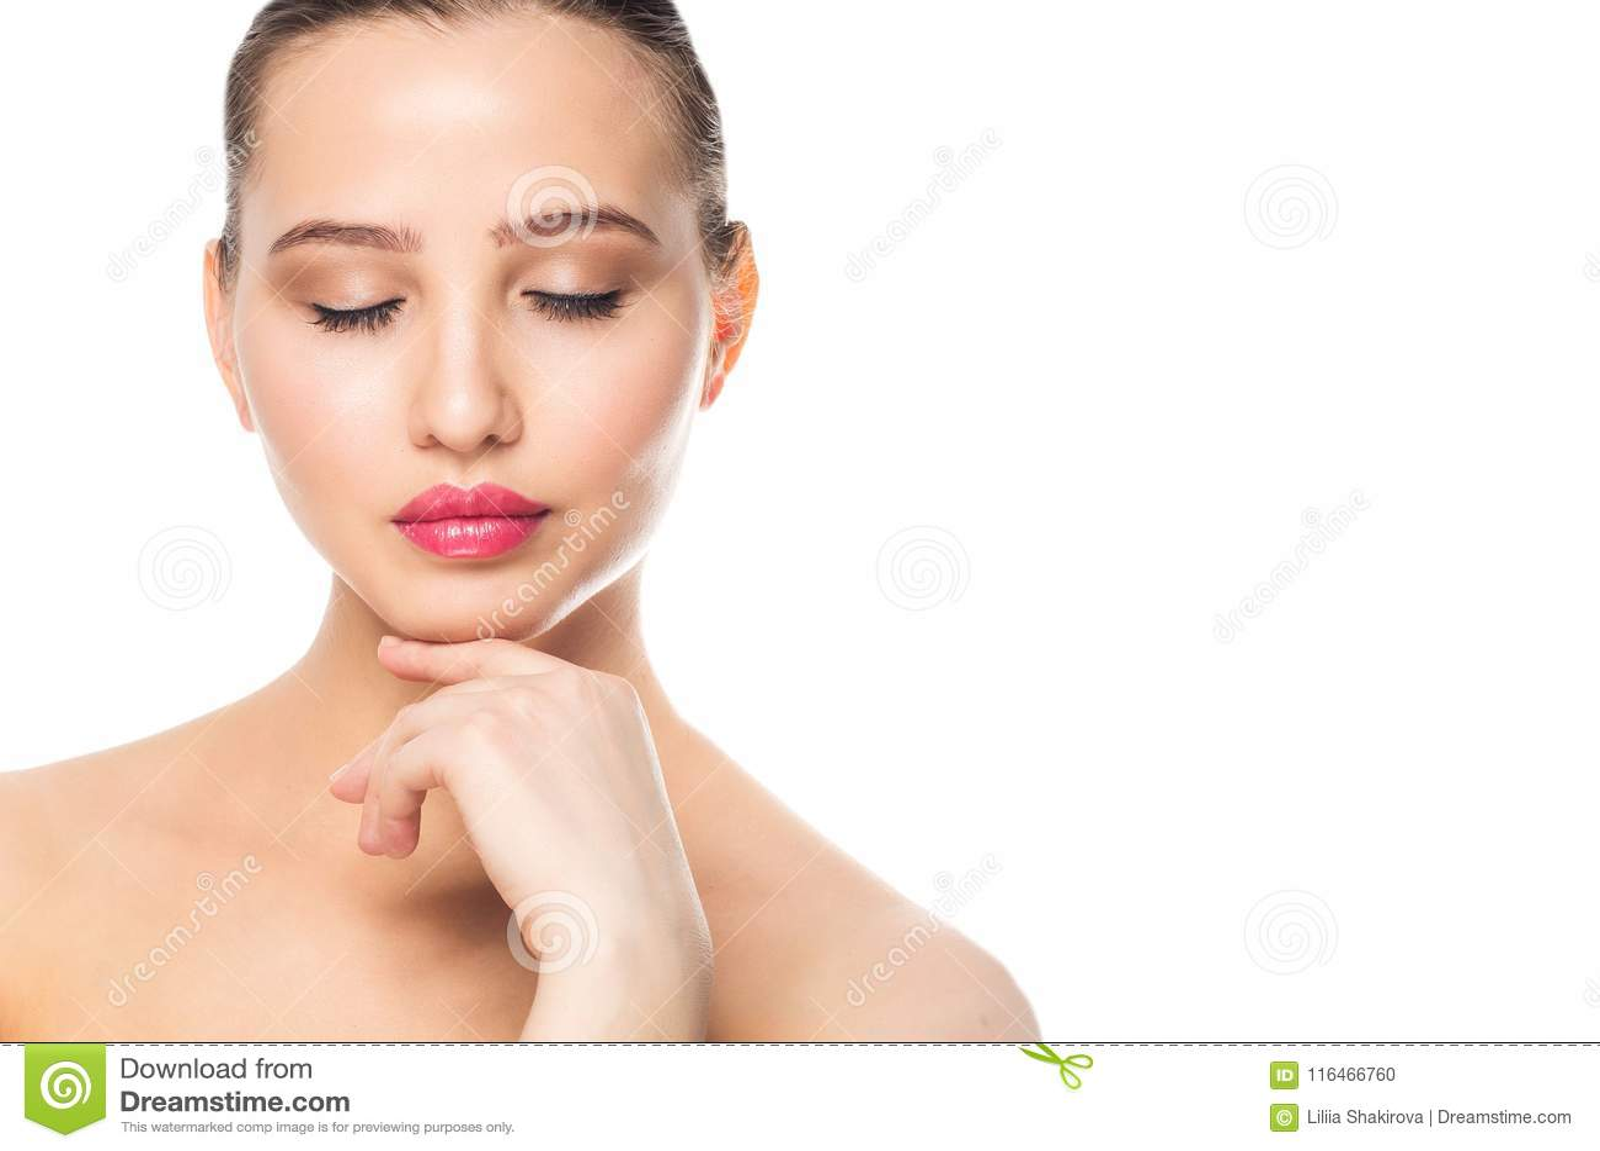 Face of a beautiful woman, closeup portrait. Spa, makeup, care, clean skin concept